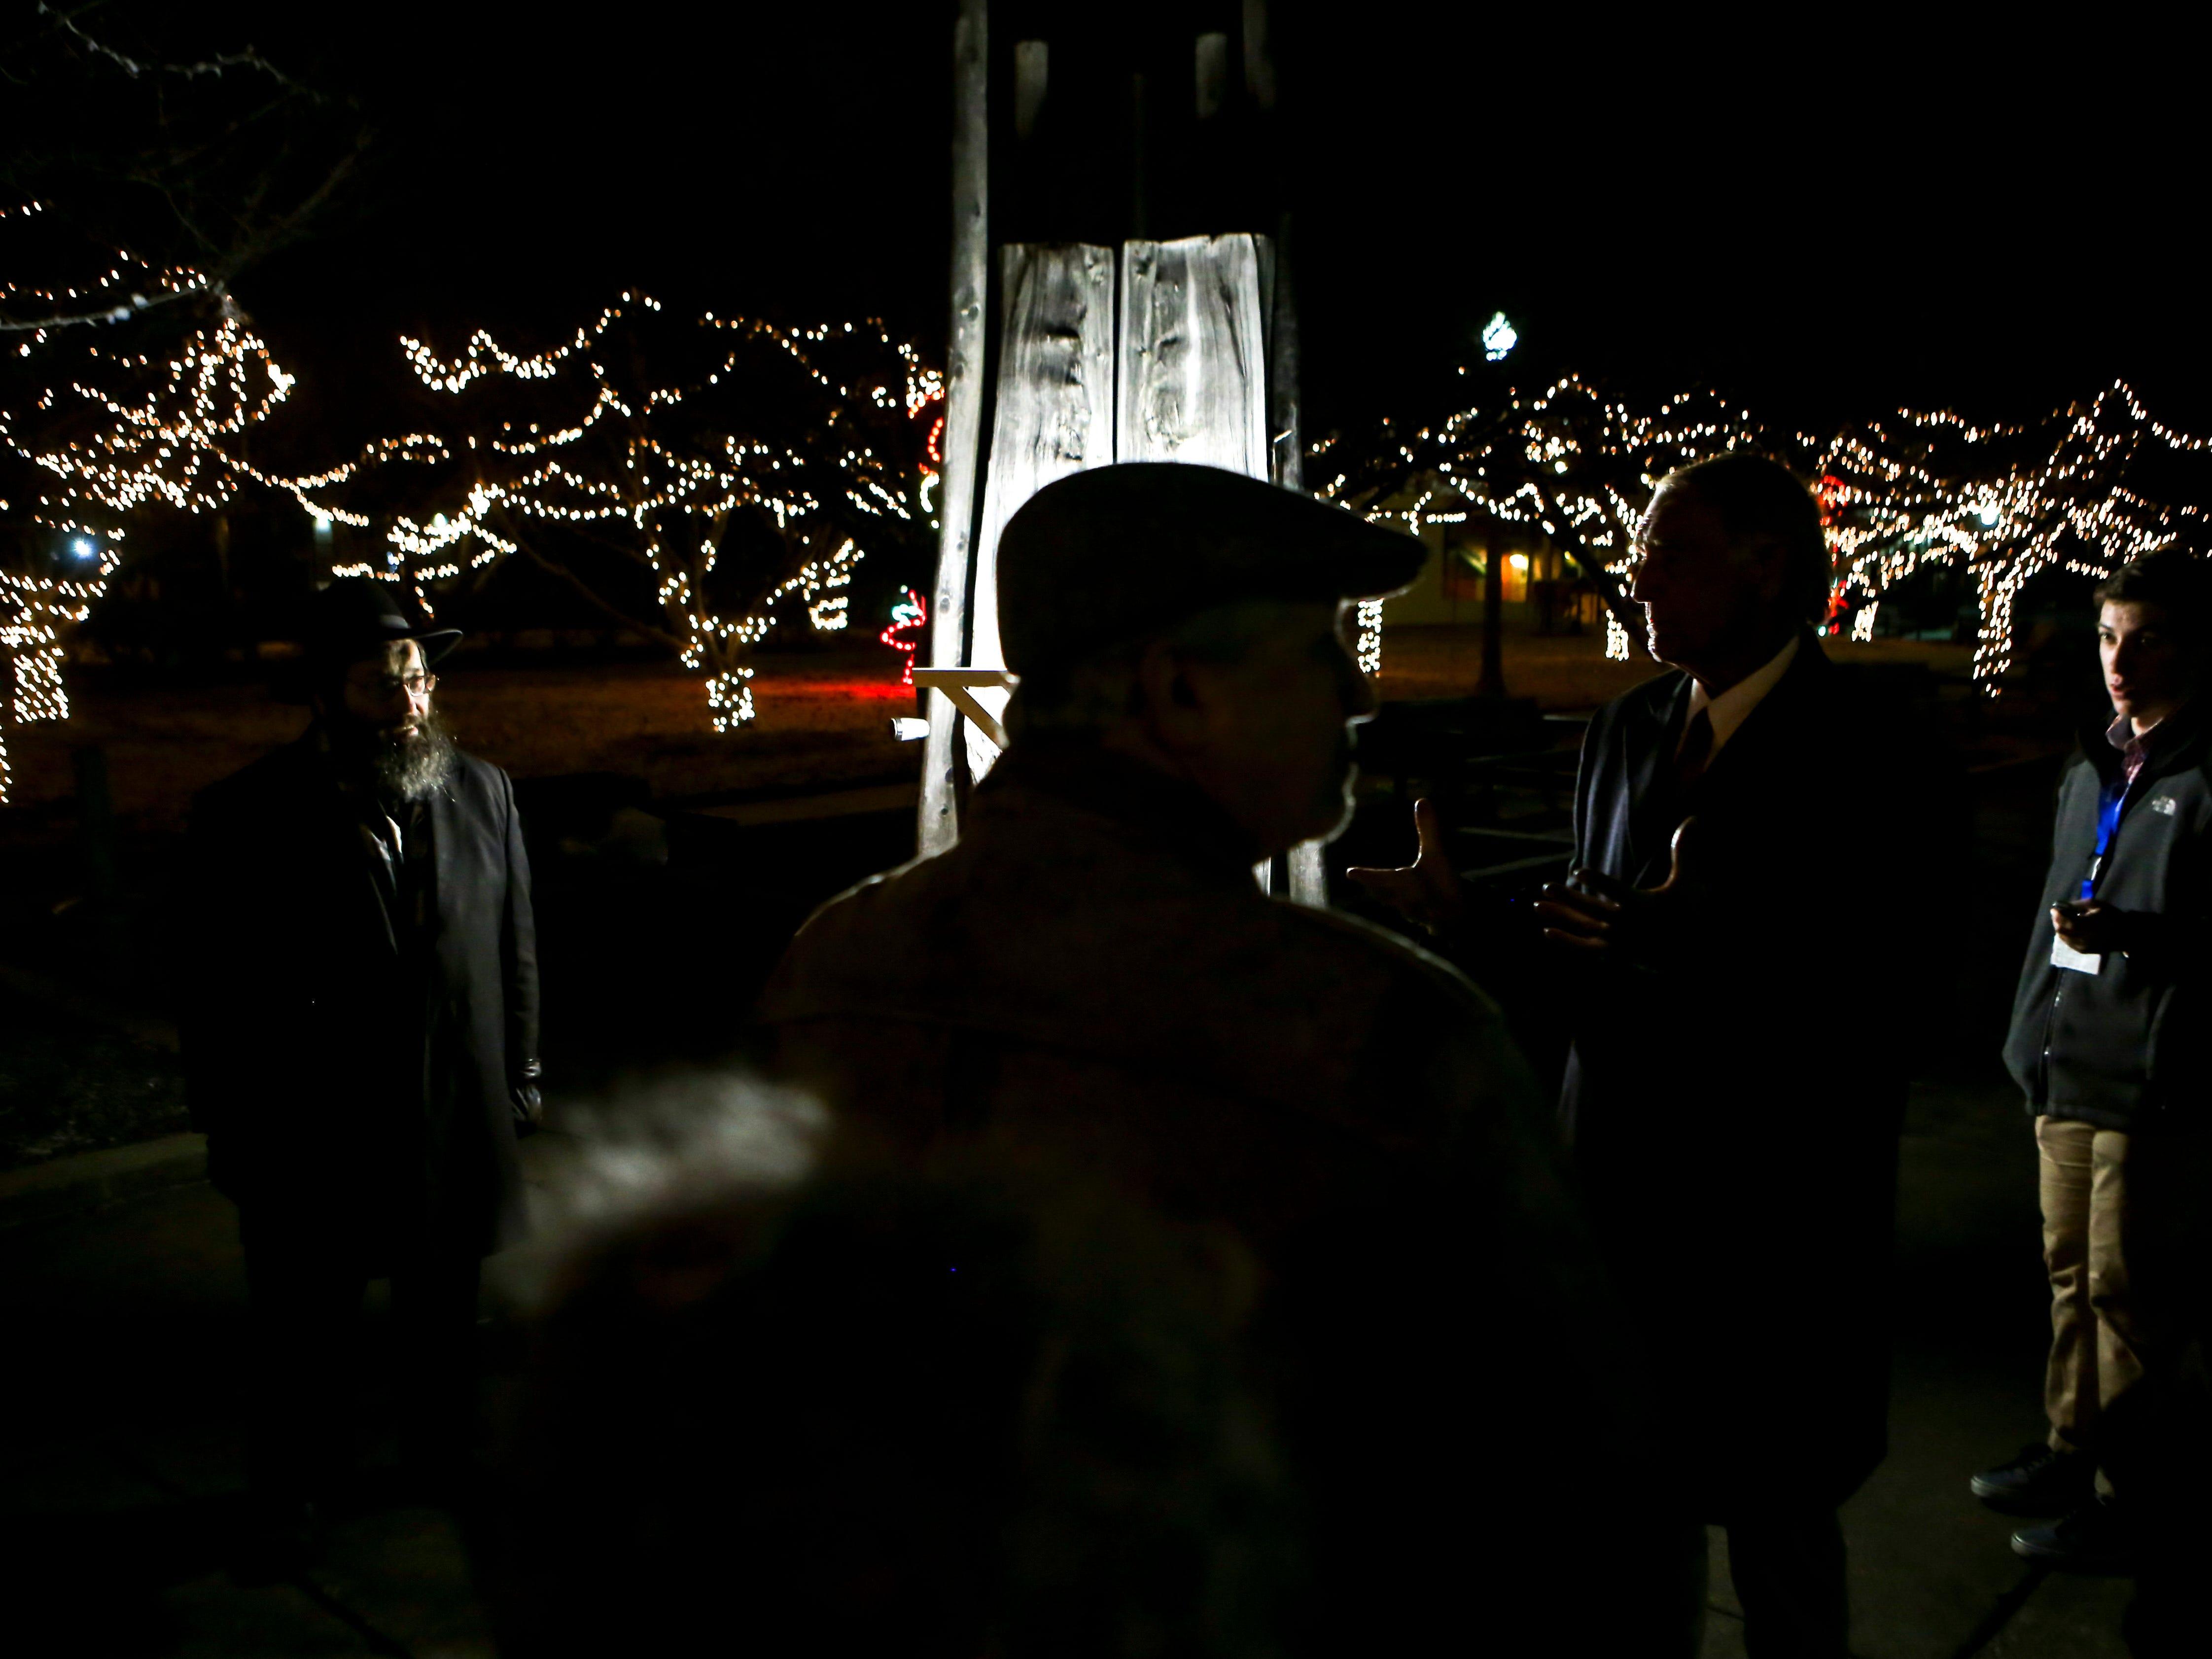 Visits gather around the lit menorah display during the first public Chanukah Menorah Lighting at Anderson Park in Jackson, Tenn., on Thursday, Dec. 6, 2018.